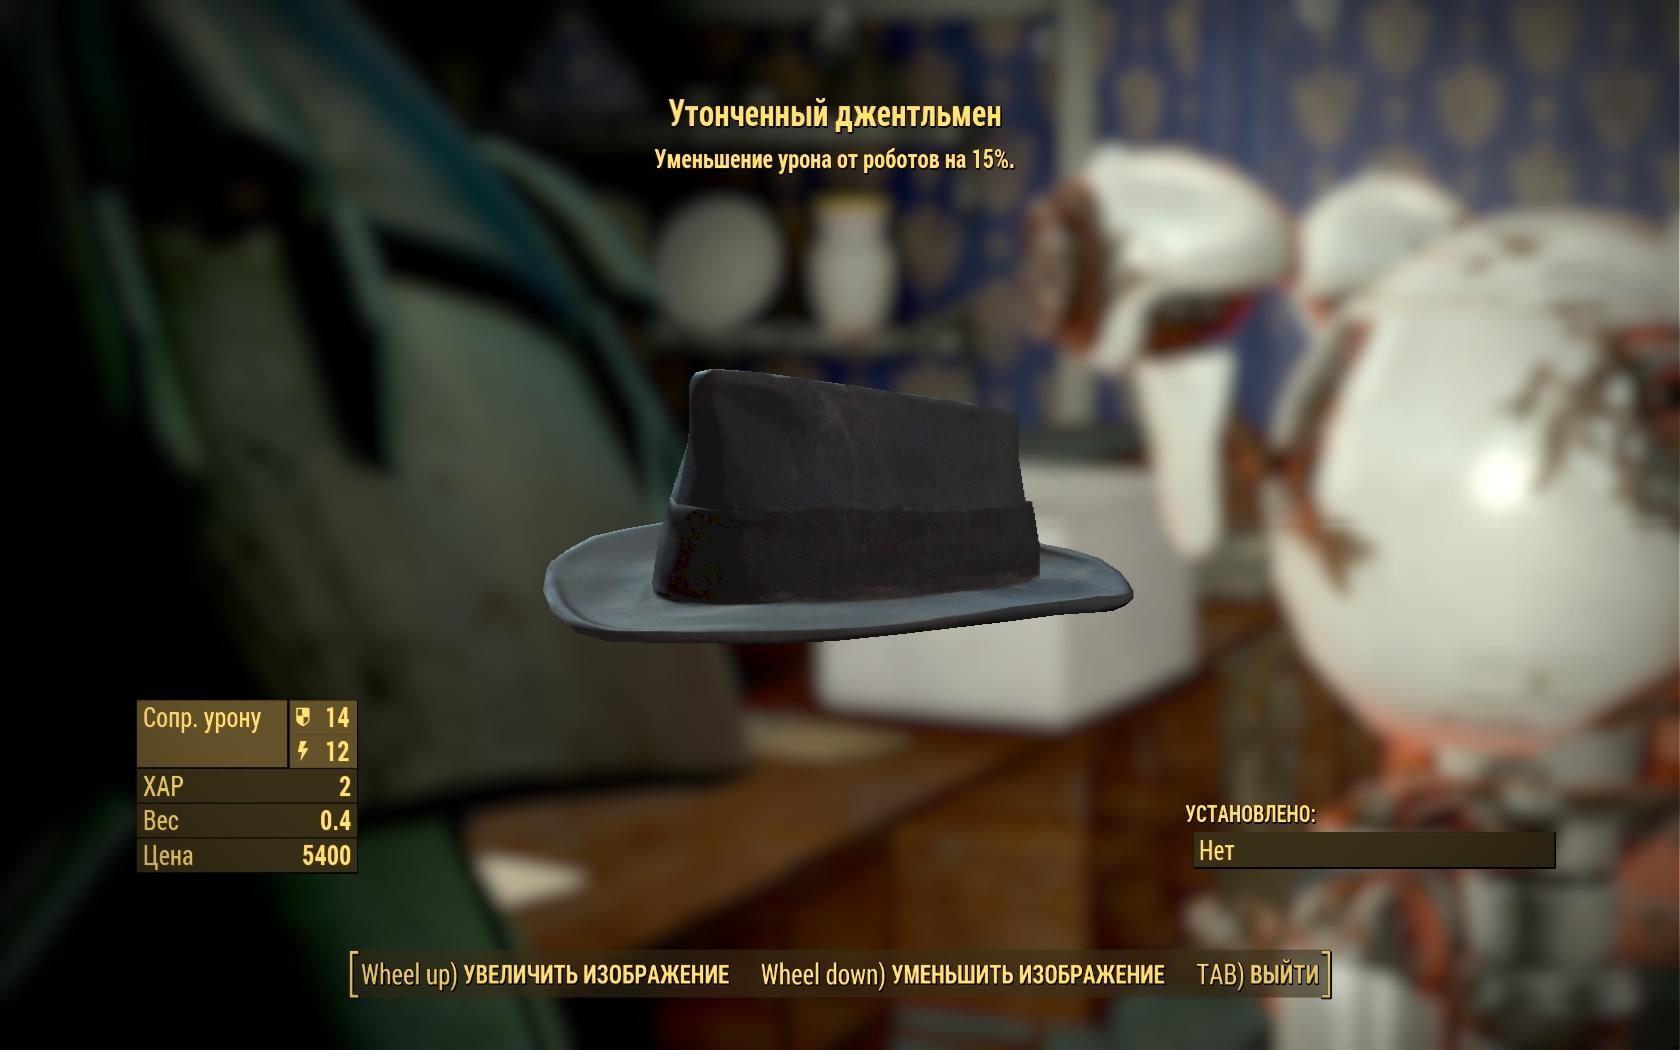 Утончённый джентльмен (Фар-Харбор) - Fallout 4 джентльмен, Одежда, Утончённый, Утончённый джентльмен